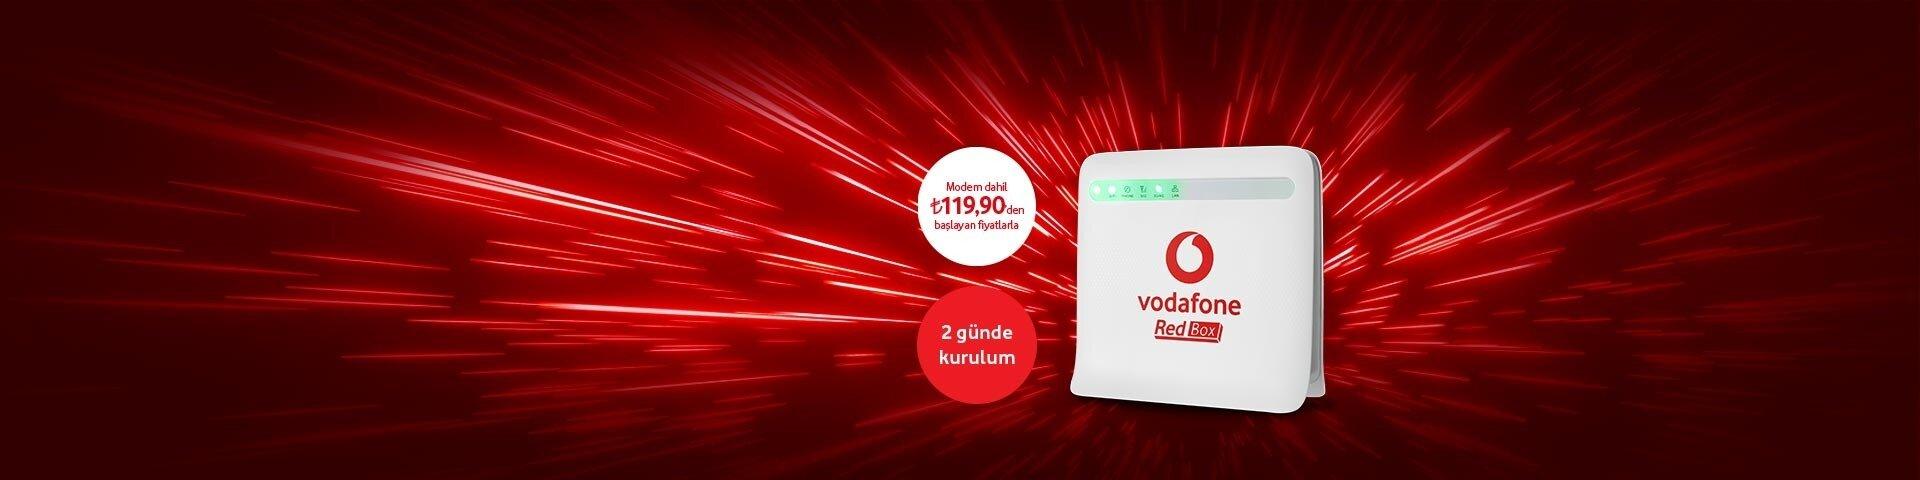 Vodafone RedBox